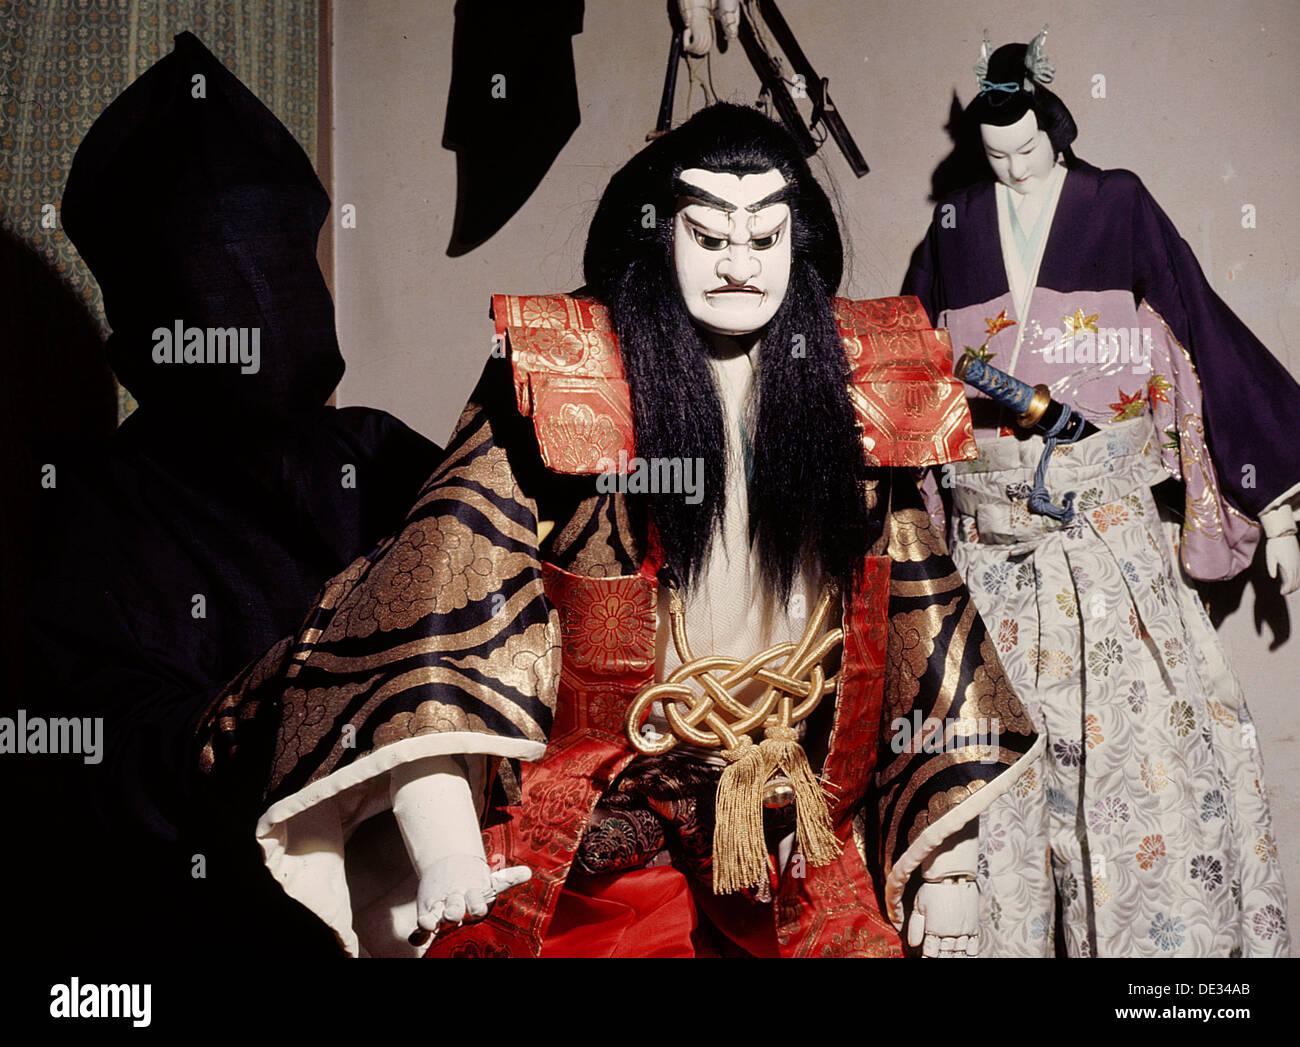 Bunraku Puppet And Hooded Puppet Master Stock Photo Alamy